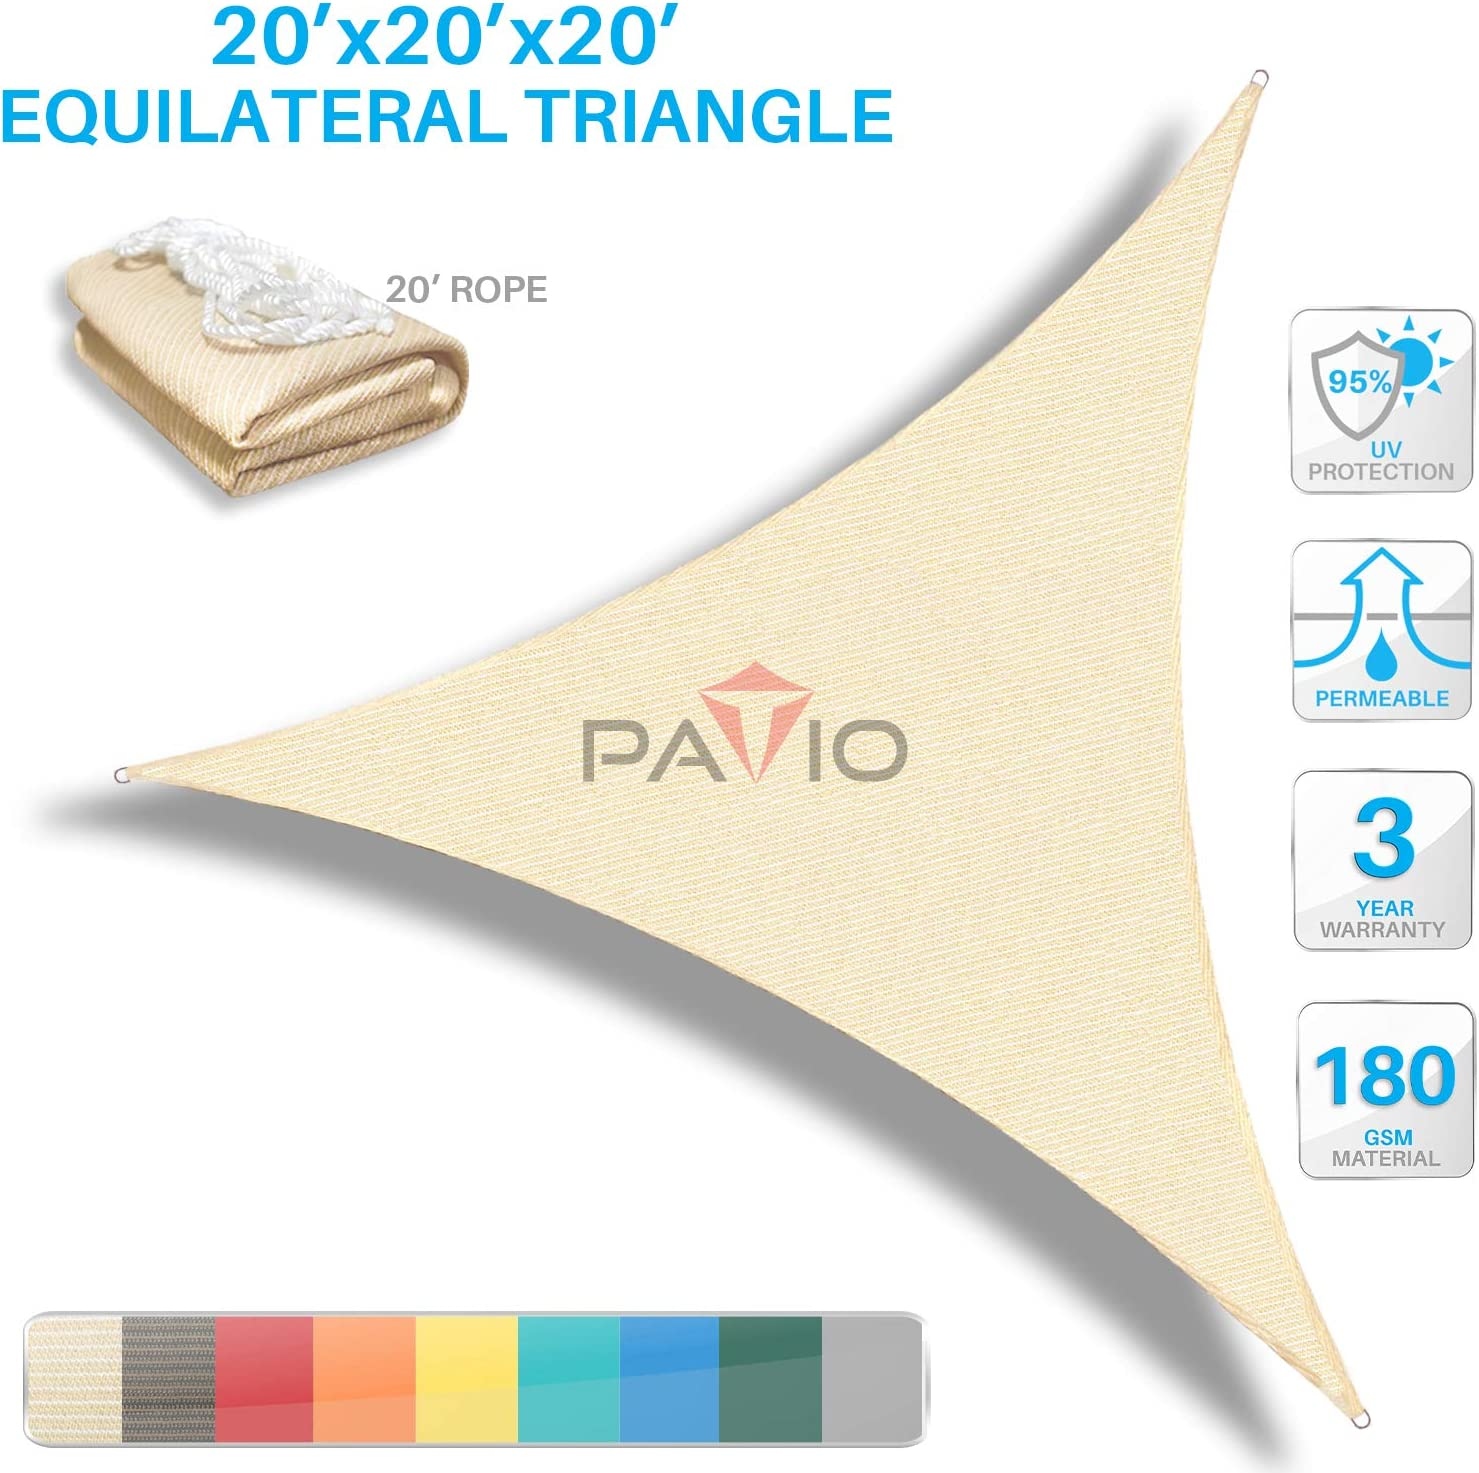 Patio Paradise 20' x20'x 20' Beige Sun Shade Sail Triangle Canopy - Permeable UV Block Fabric Durable Outdoor- Customized Available